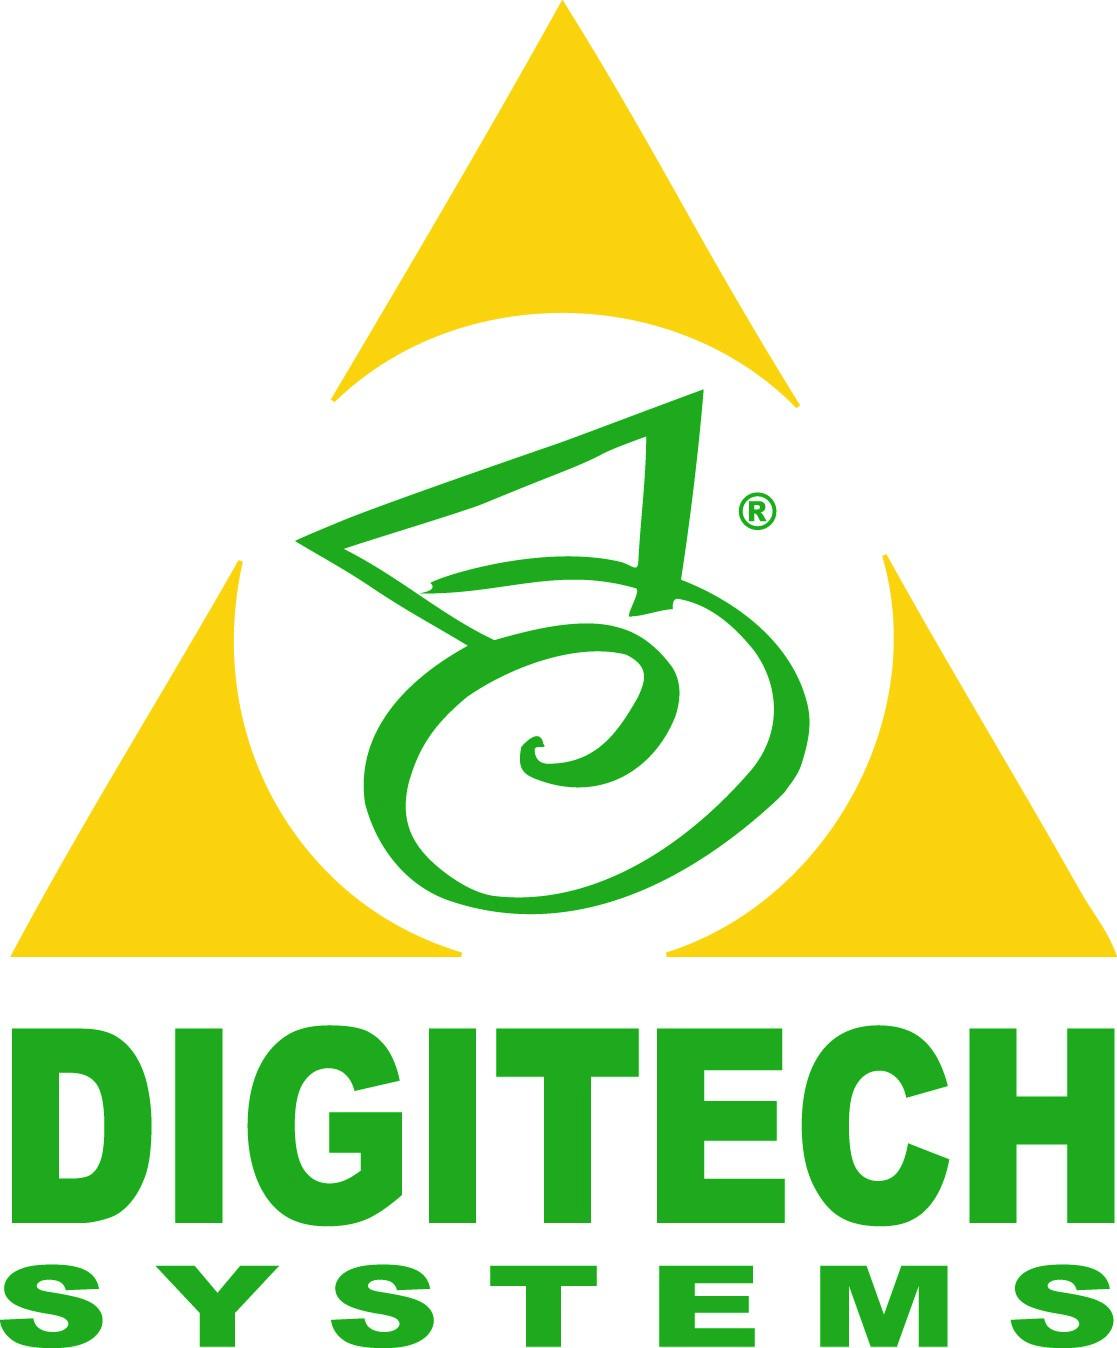 Digitech image